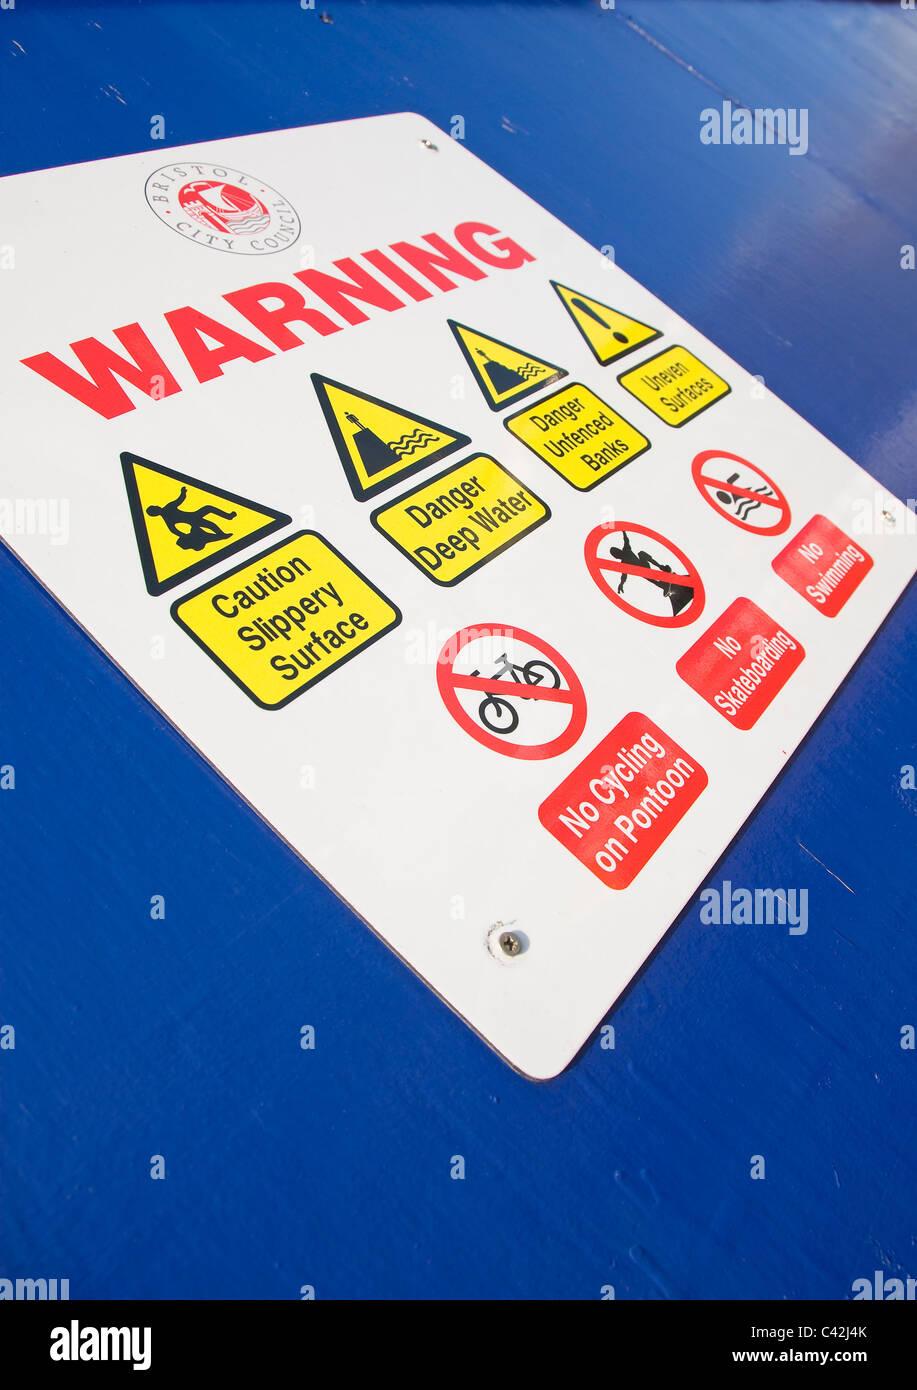 Warning sign, Harbour, Bristol, UK - Stock Image